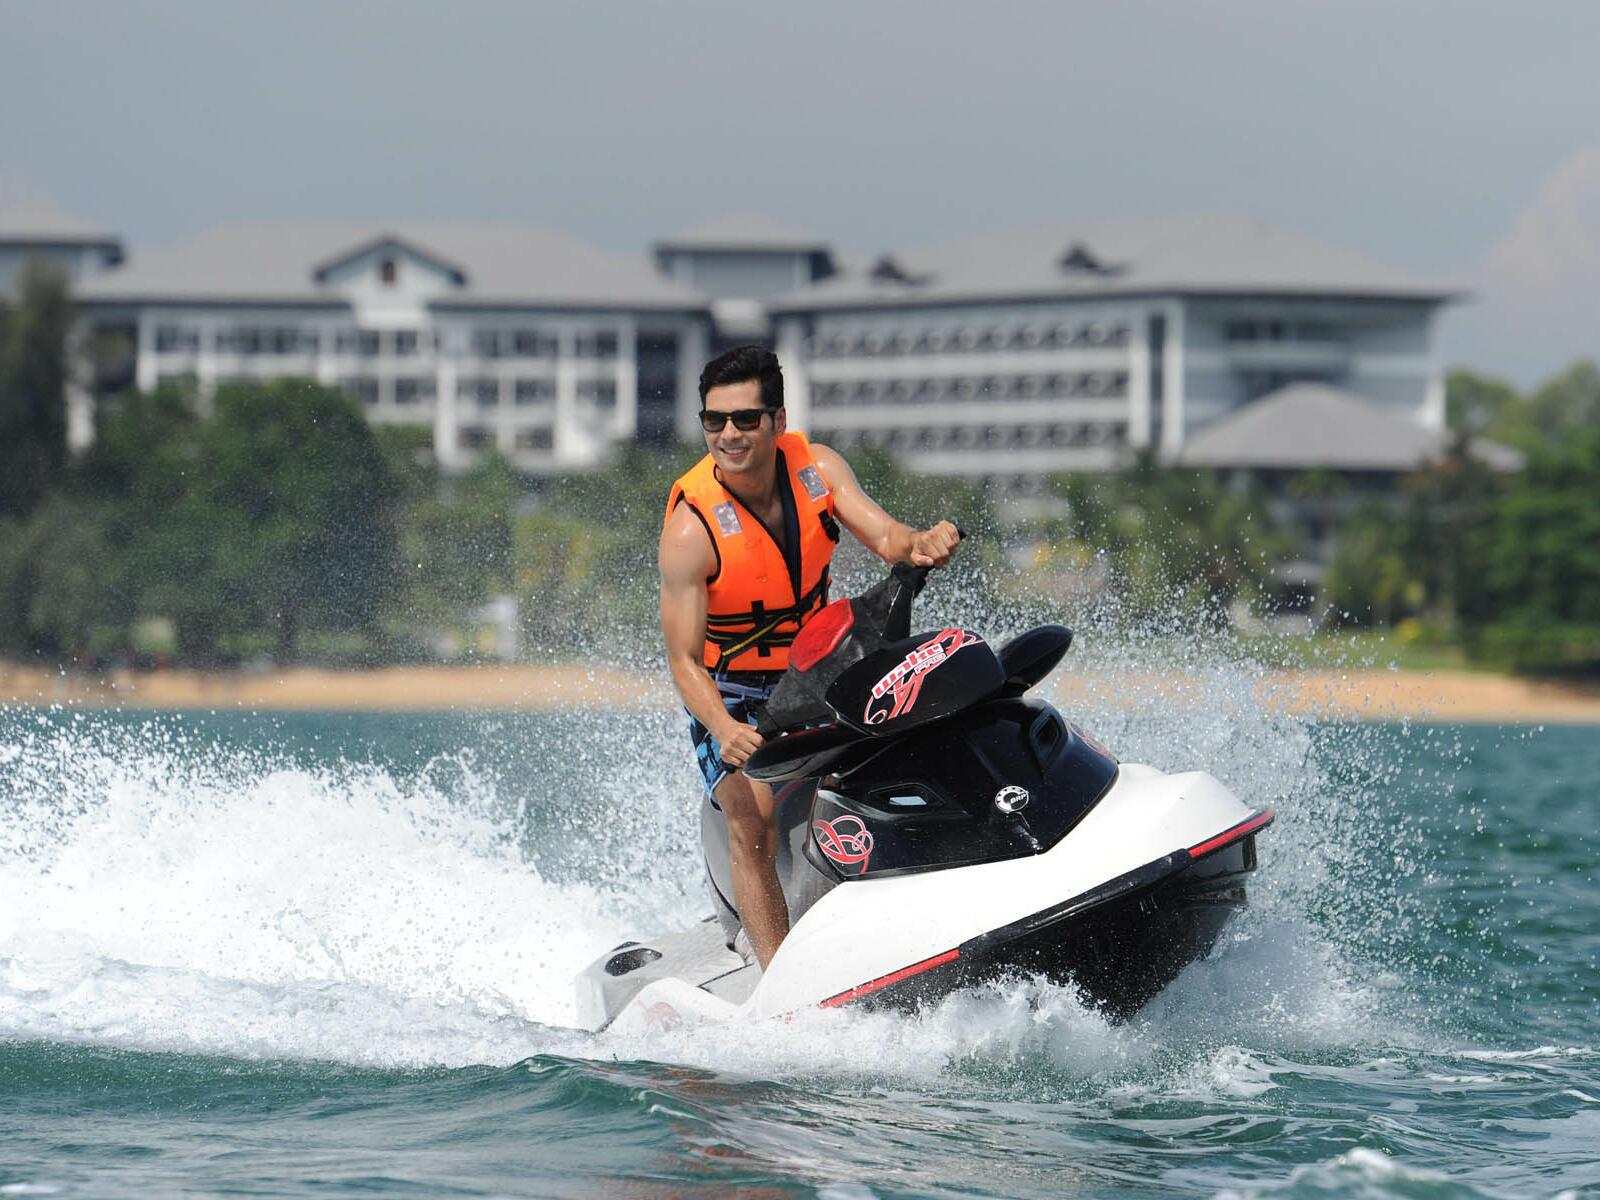 A man jet-skiing